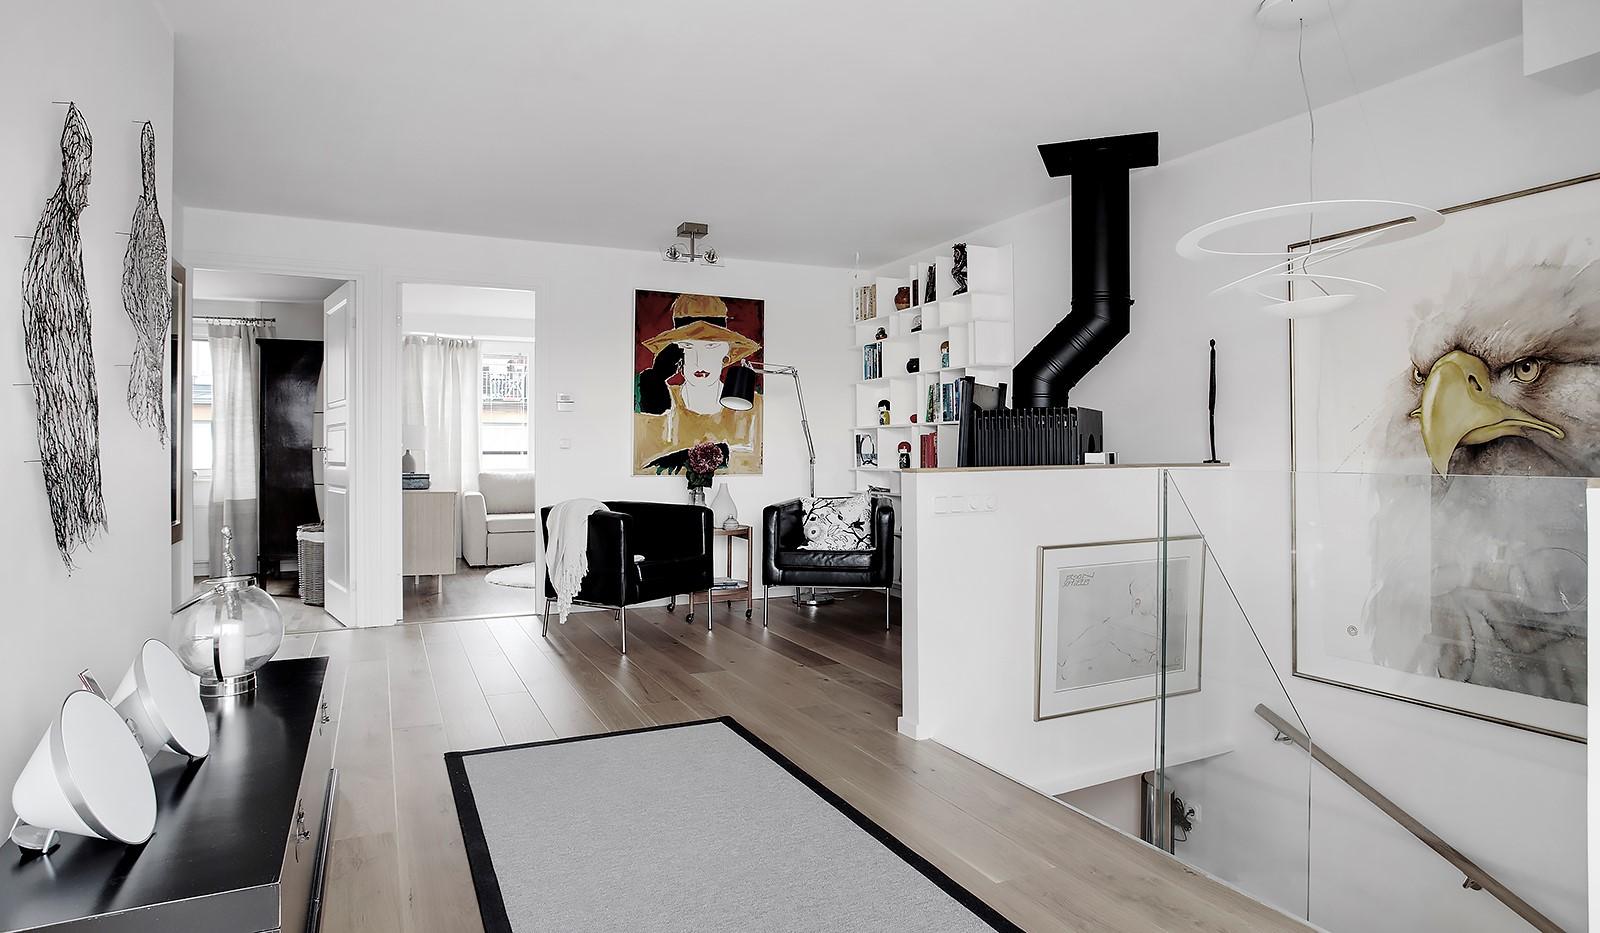 Swedenborgsgatan 42-11